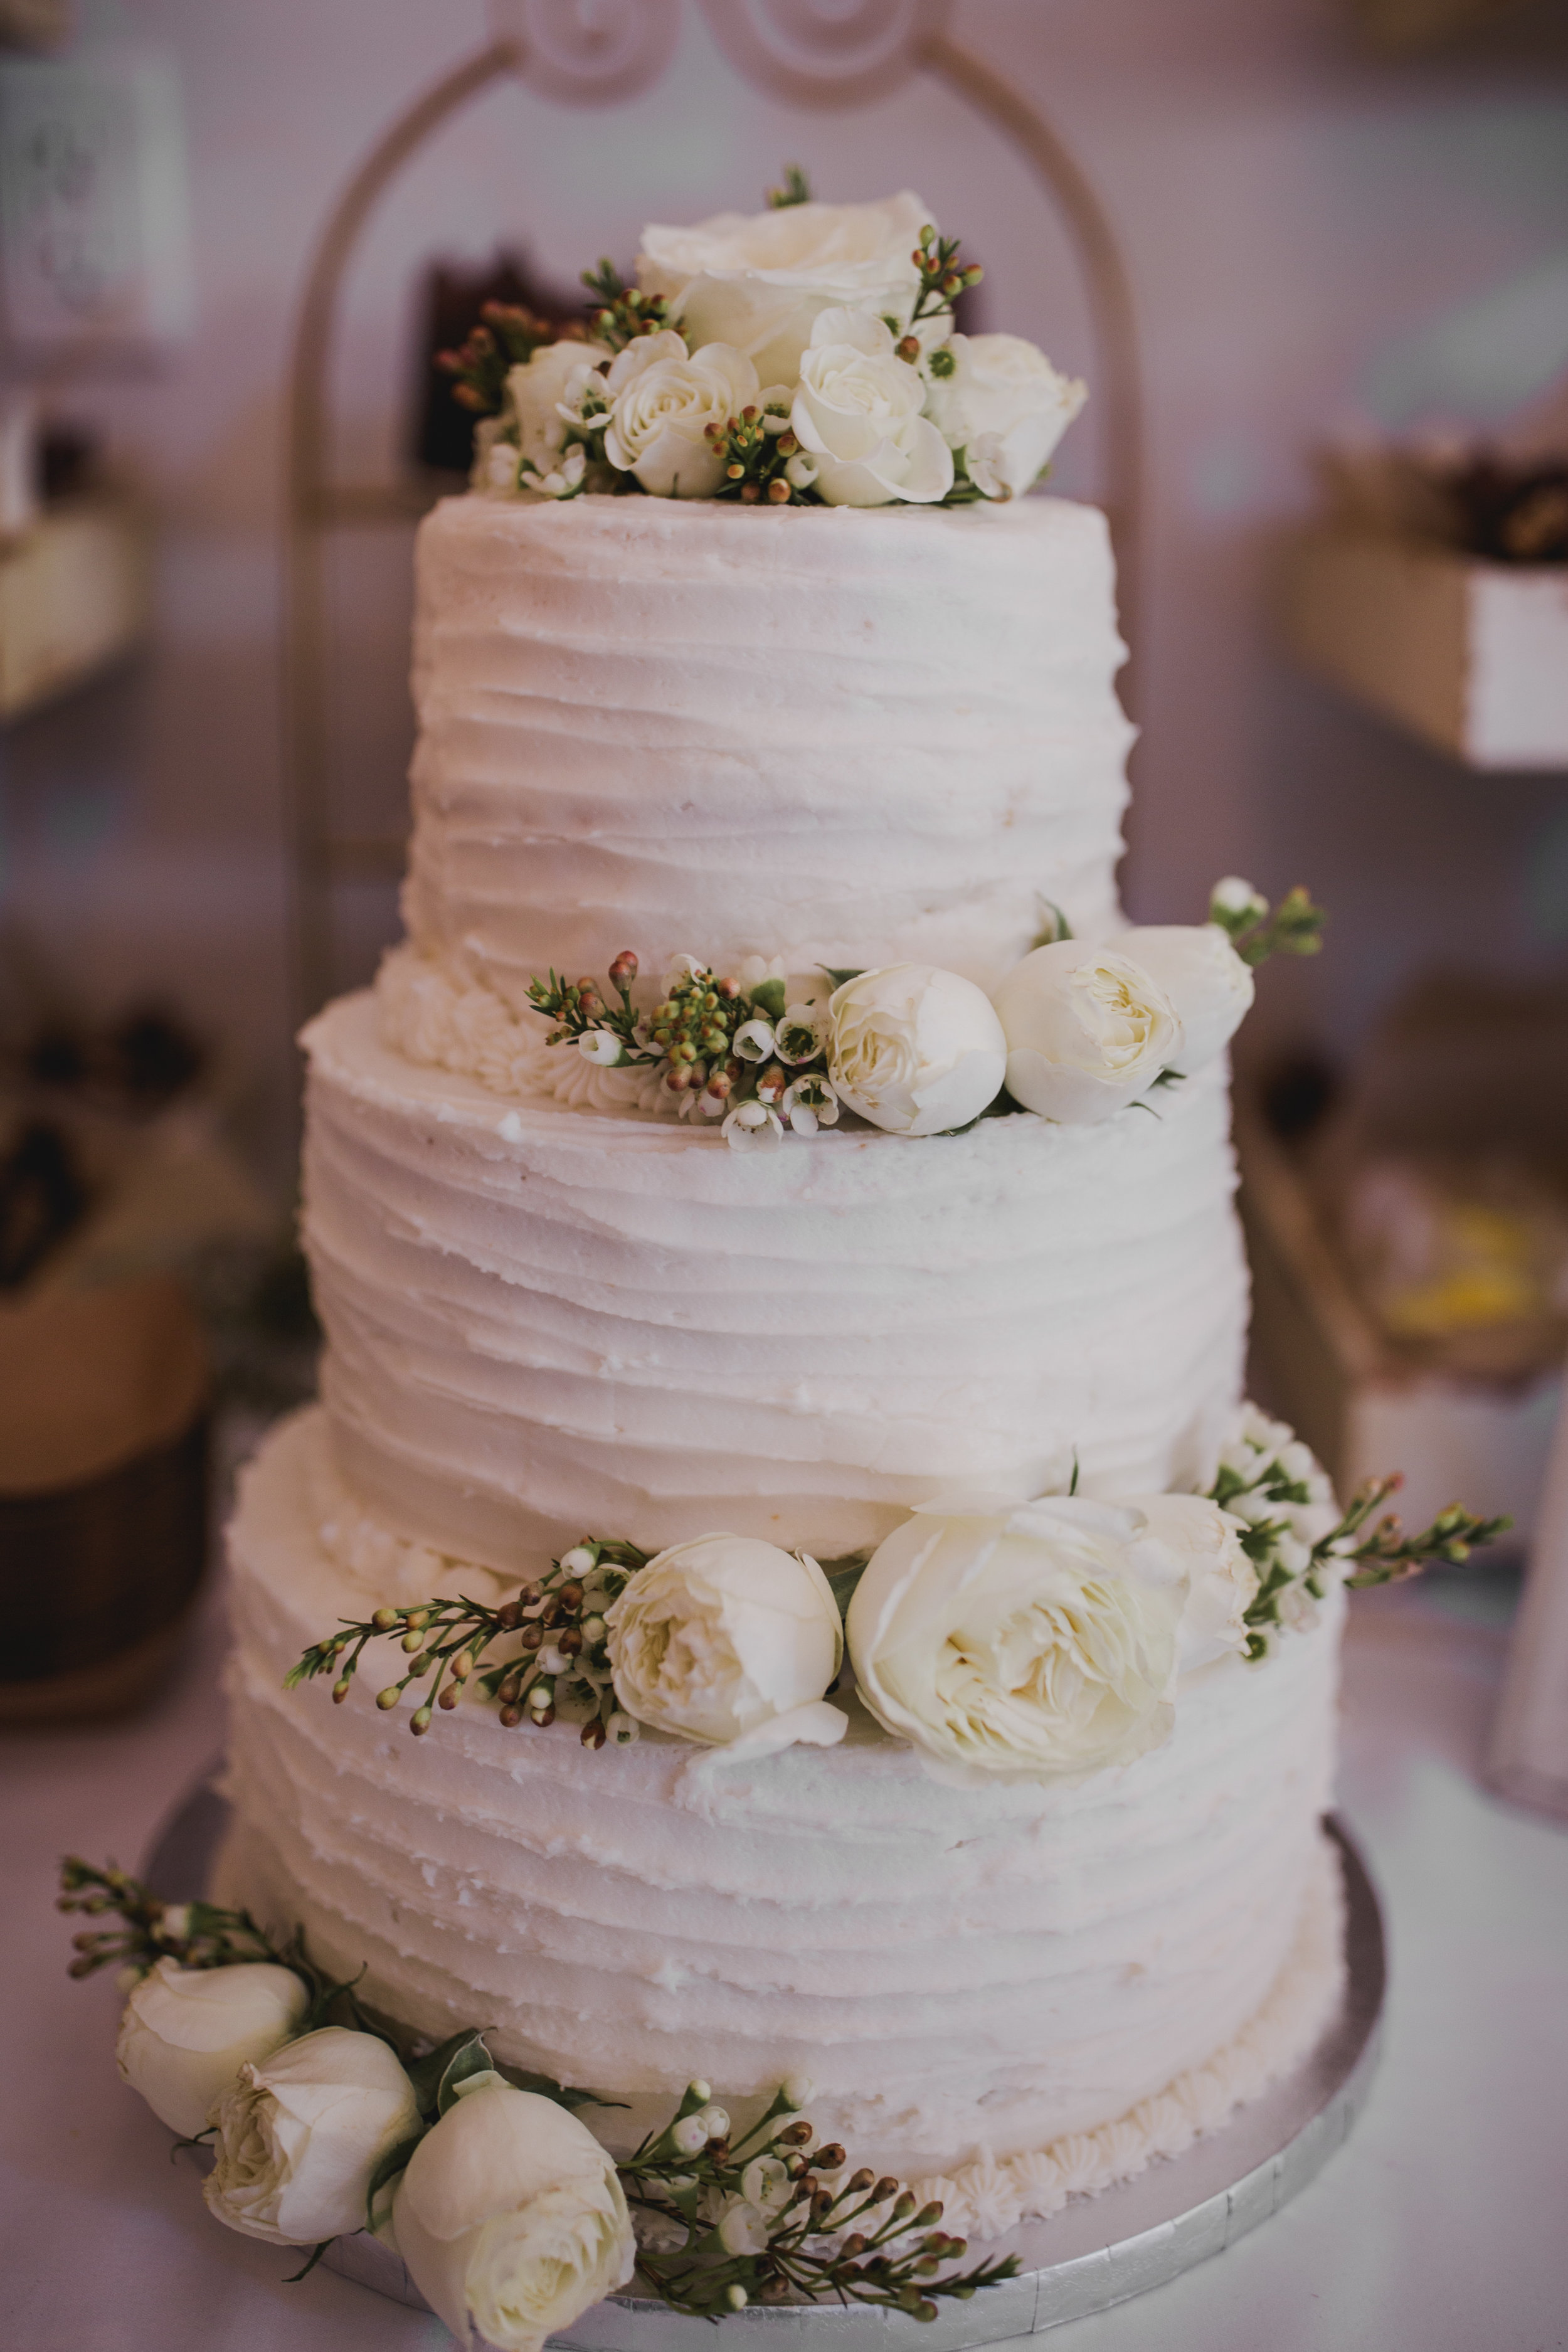 Sibyl_Sophia_Wedding_Florist_Mason_City_Diamond_Oaks_Cake.jpg